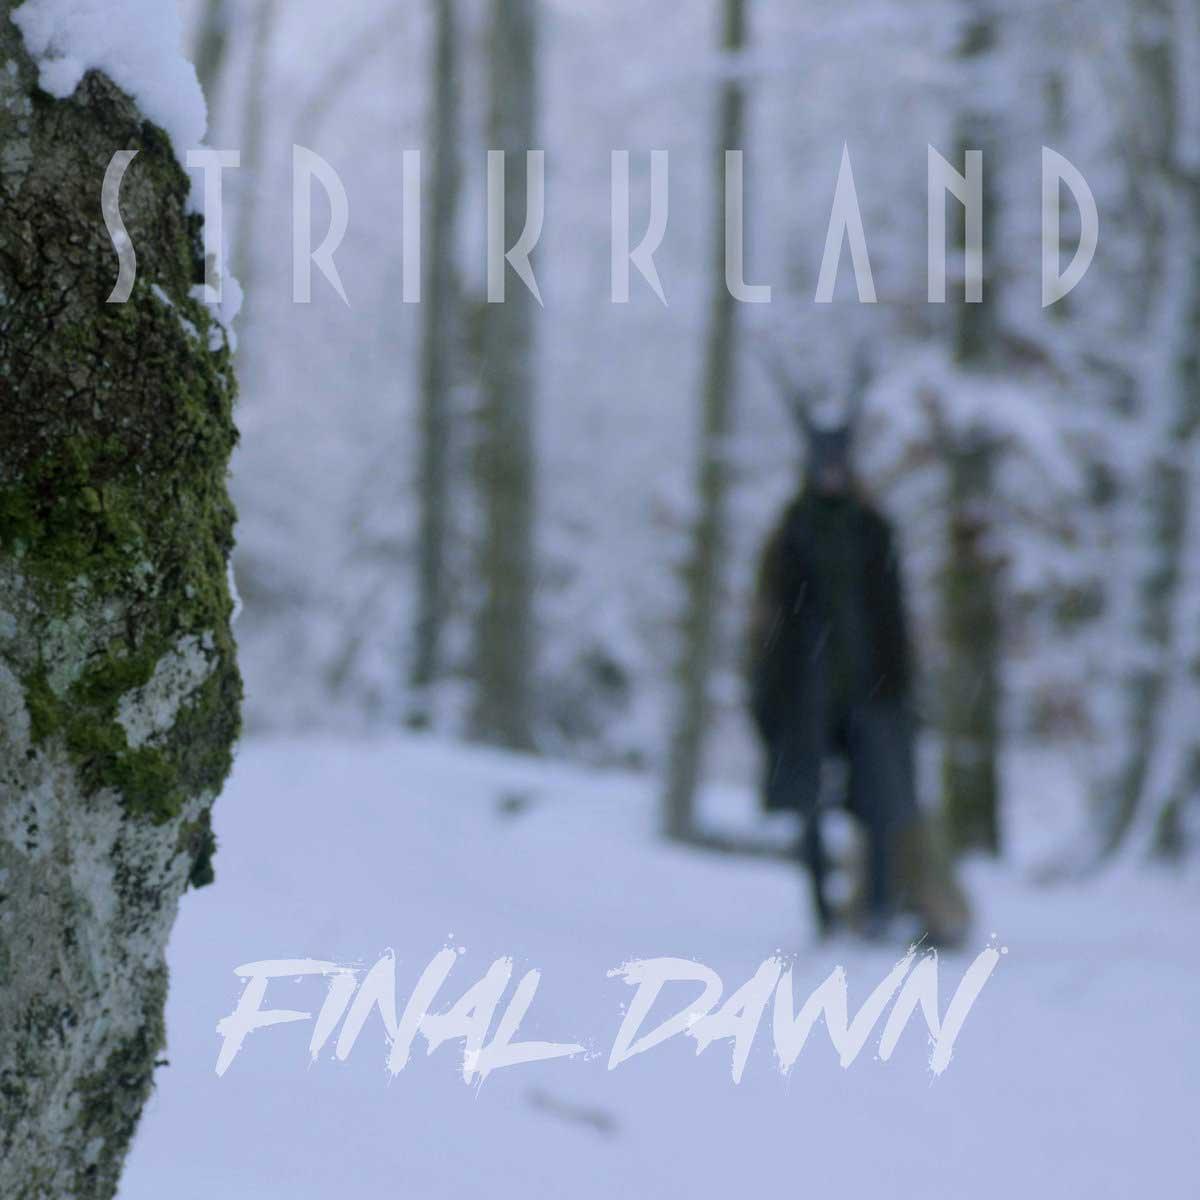 Strikkland - Final Dawn - Strikkland - Final Dawn